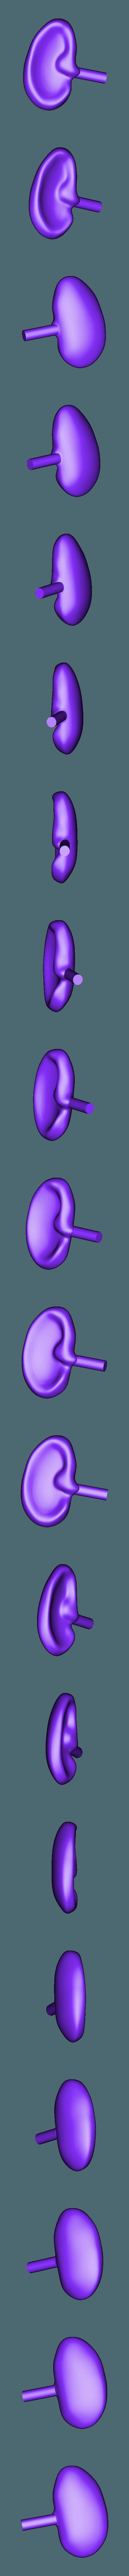 right_ear.stl Download free STL file Mr. Potato Head [Toy Story] • 3D printer template, Dream_it_Model_it